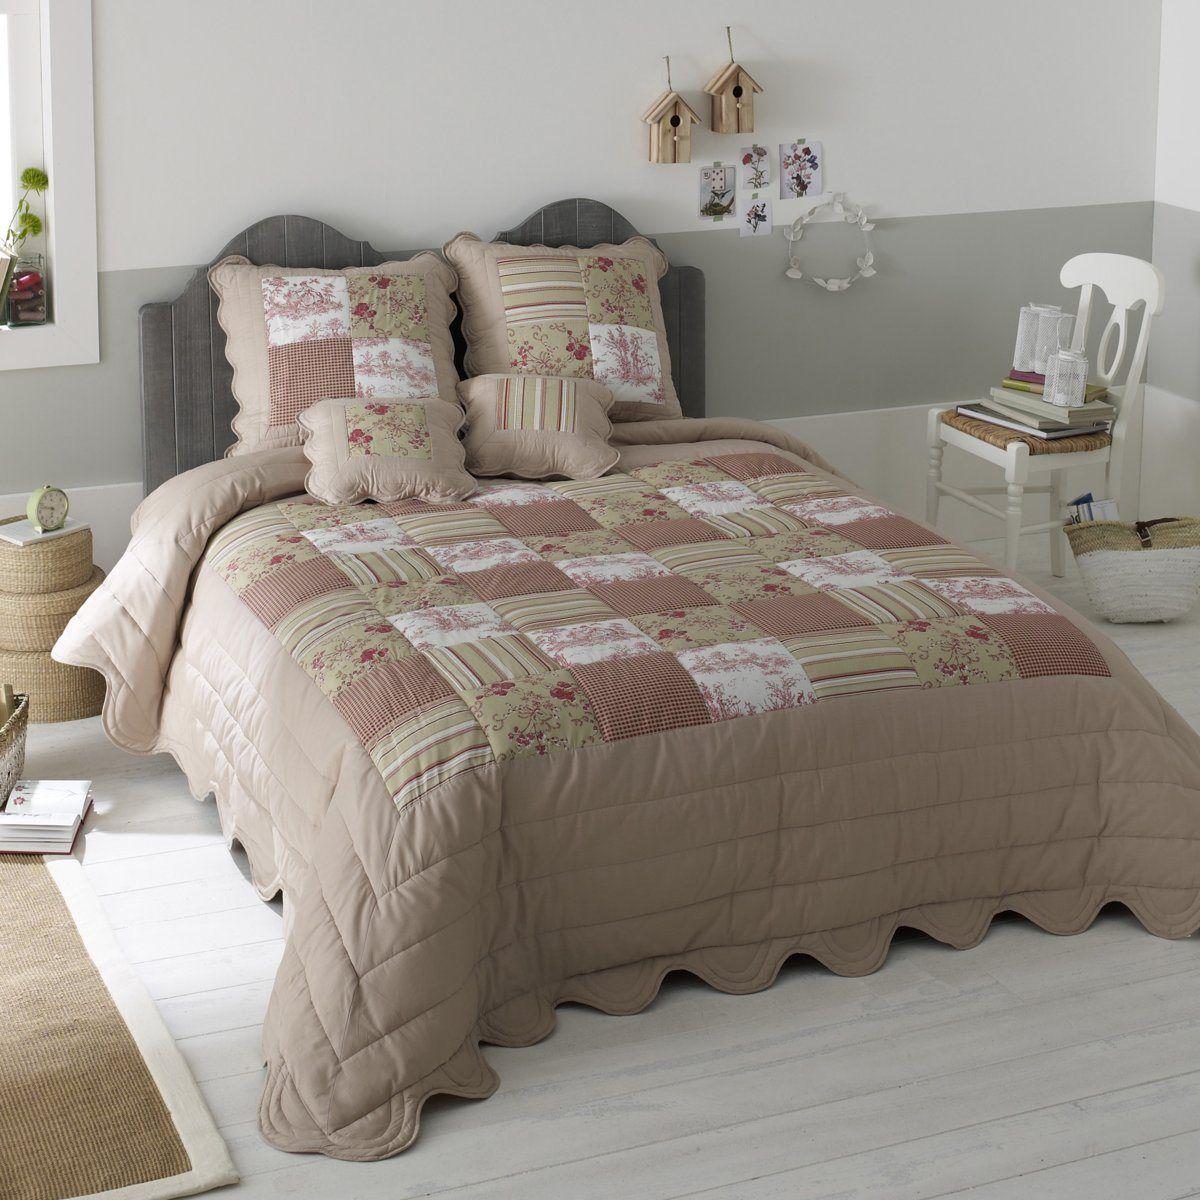 couvre lit patchwork laredoute d co couvre lit. Black Bedroom Furniture Sets. Home Design Ideas